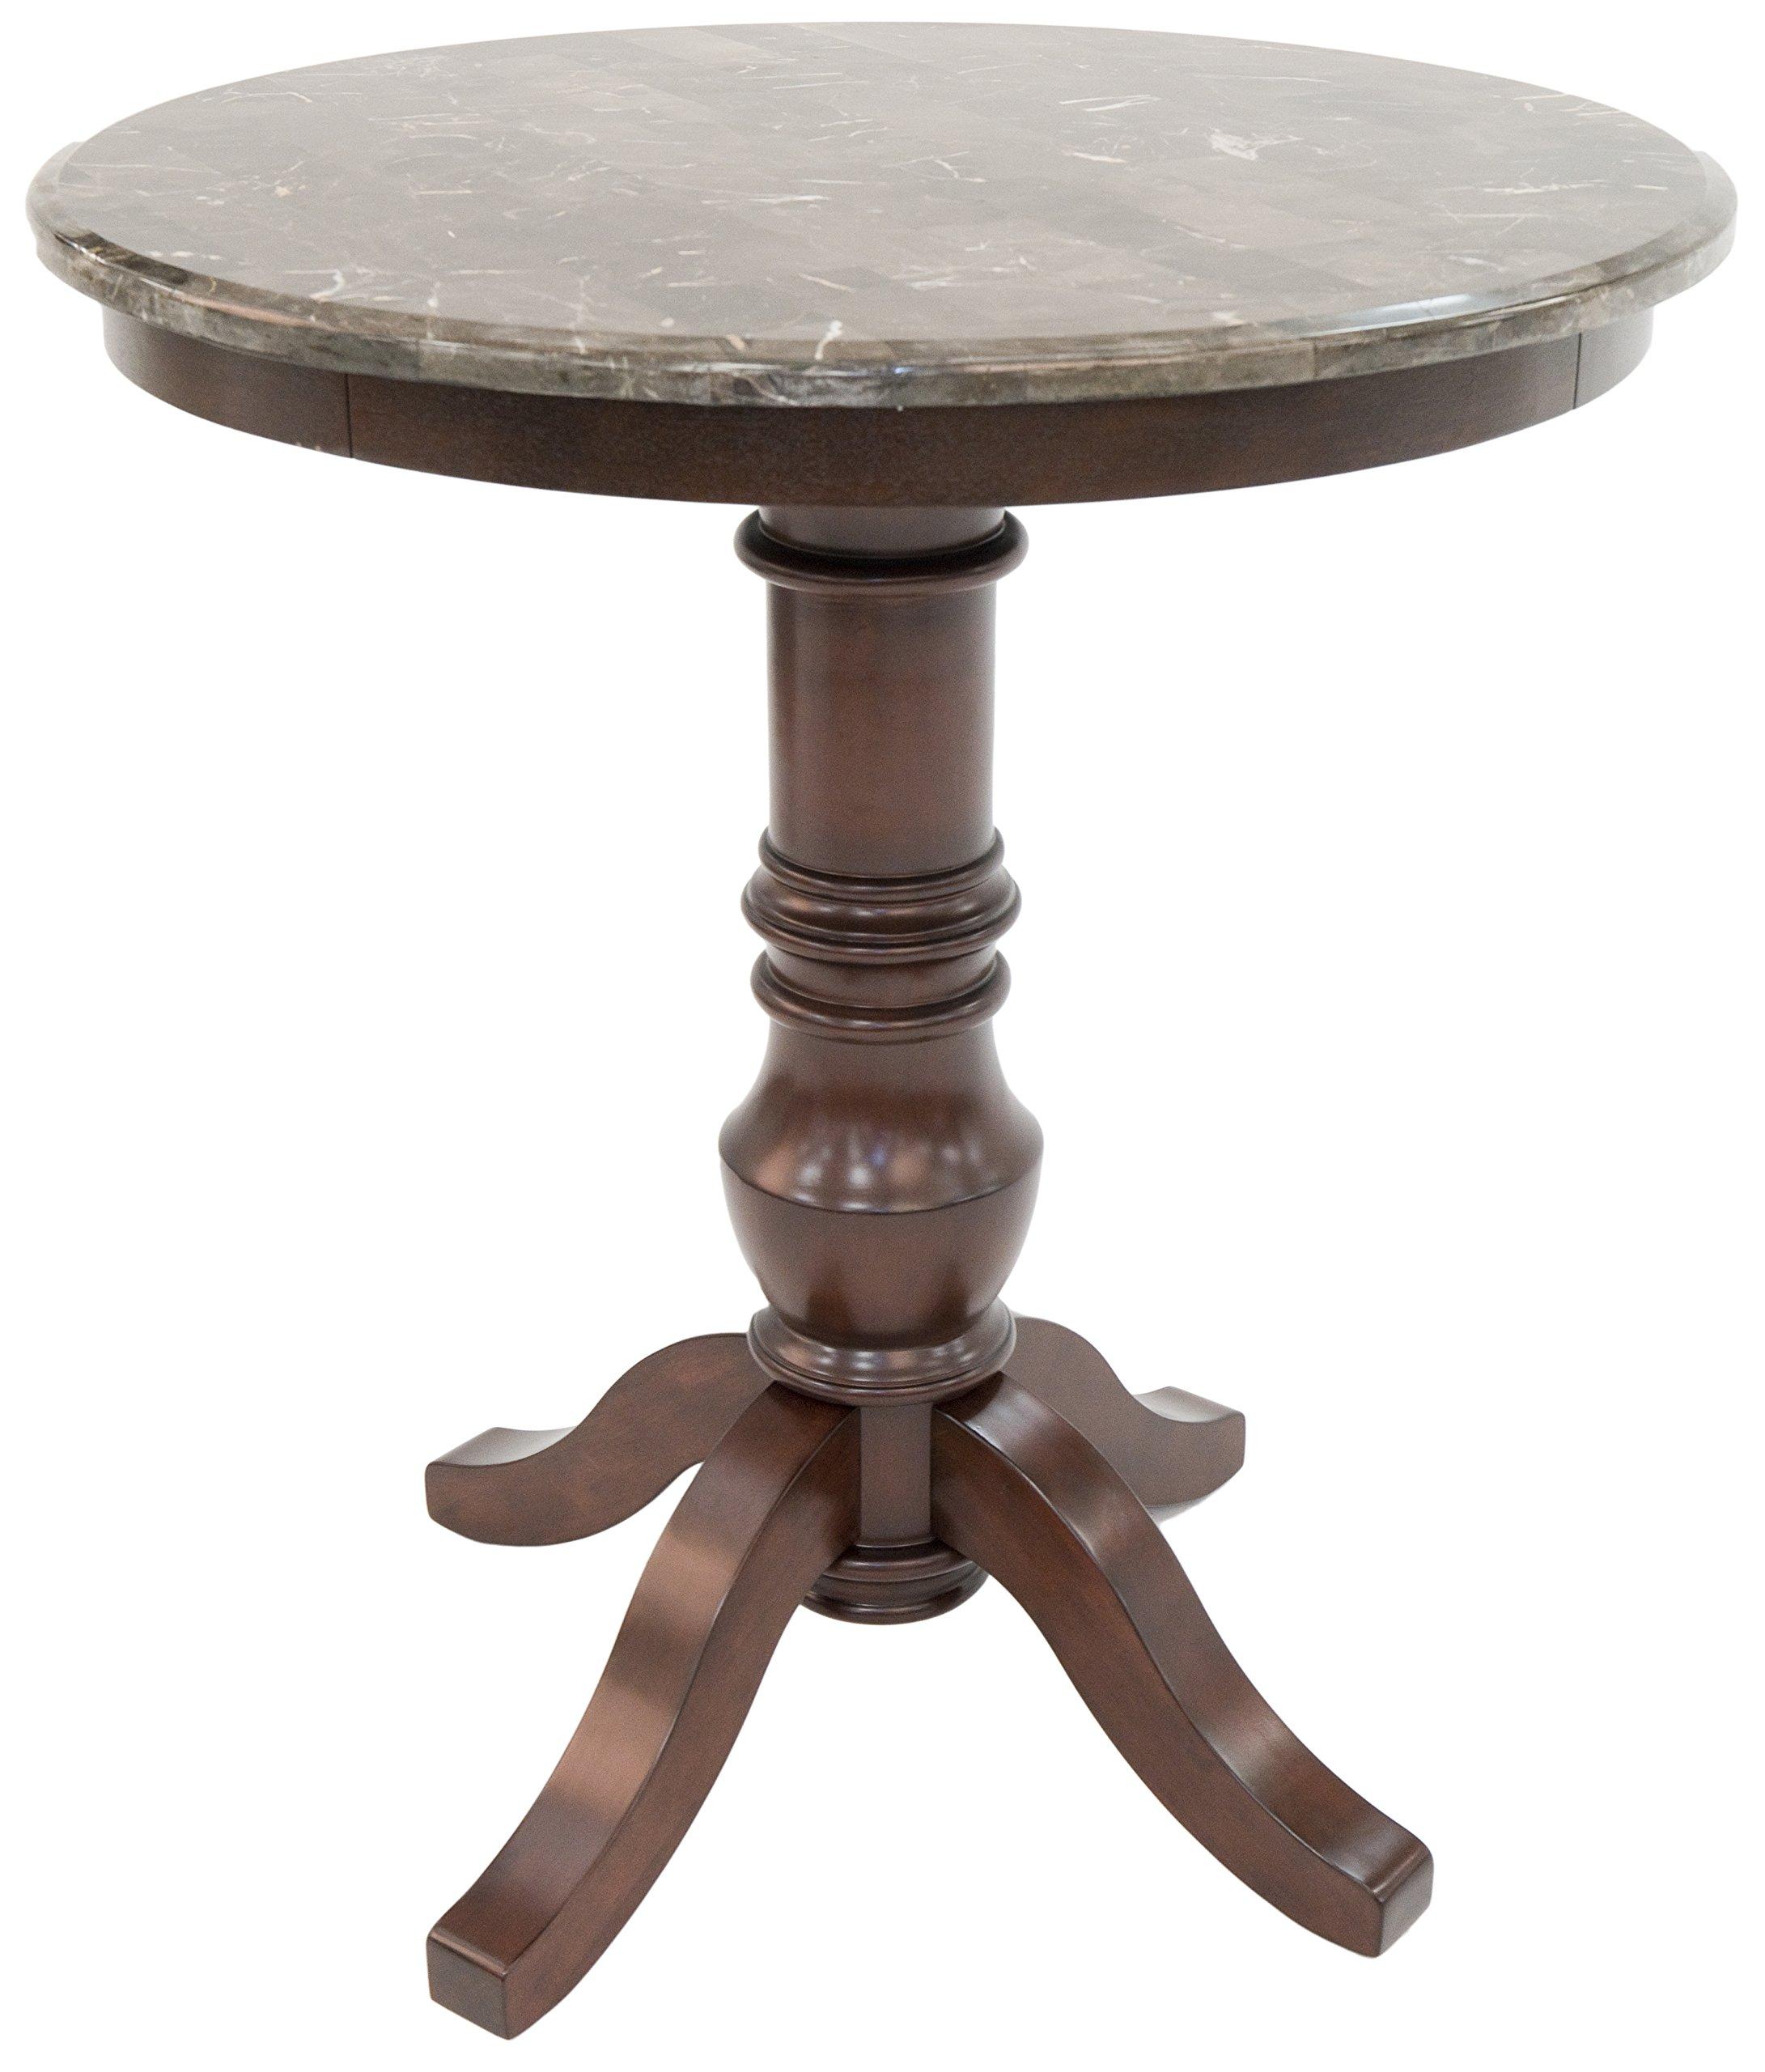 Impacterra Georgia Bar Table, Cosmo Amber/Mesa Twilight, Bar Height by Impacterra (Image #1)